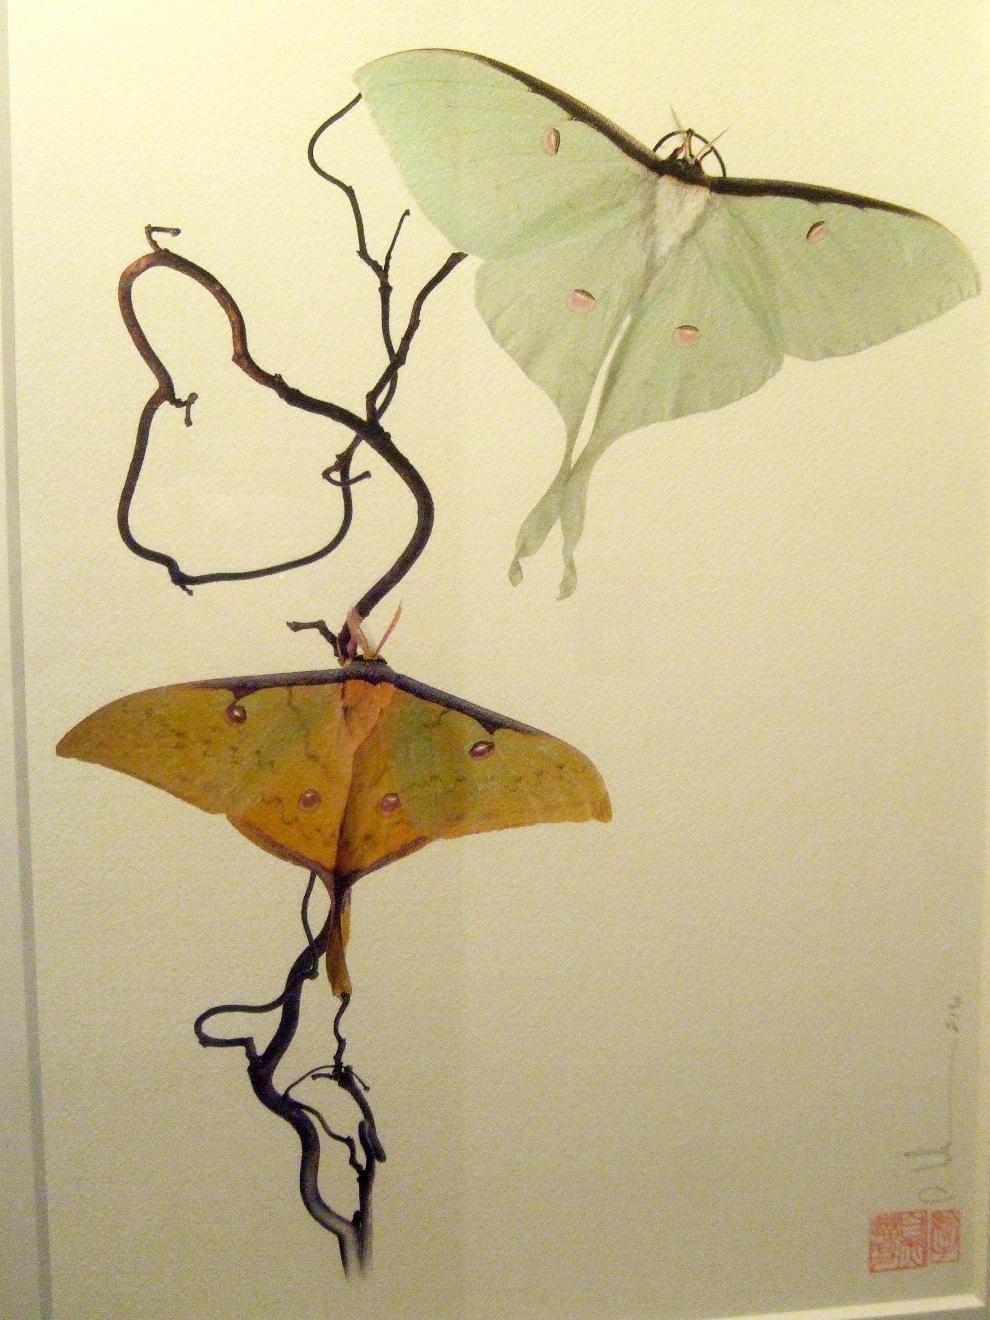 1063) af 「ステファン・エッテ写真展 『蝶の夢』」 終了・7月7日(火)~8月8日(土) _f0126829_13391232.jpg